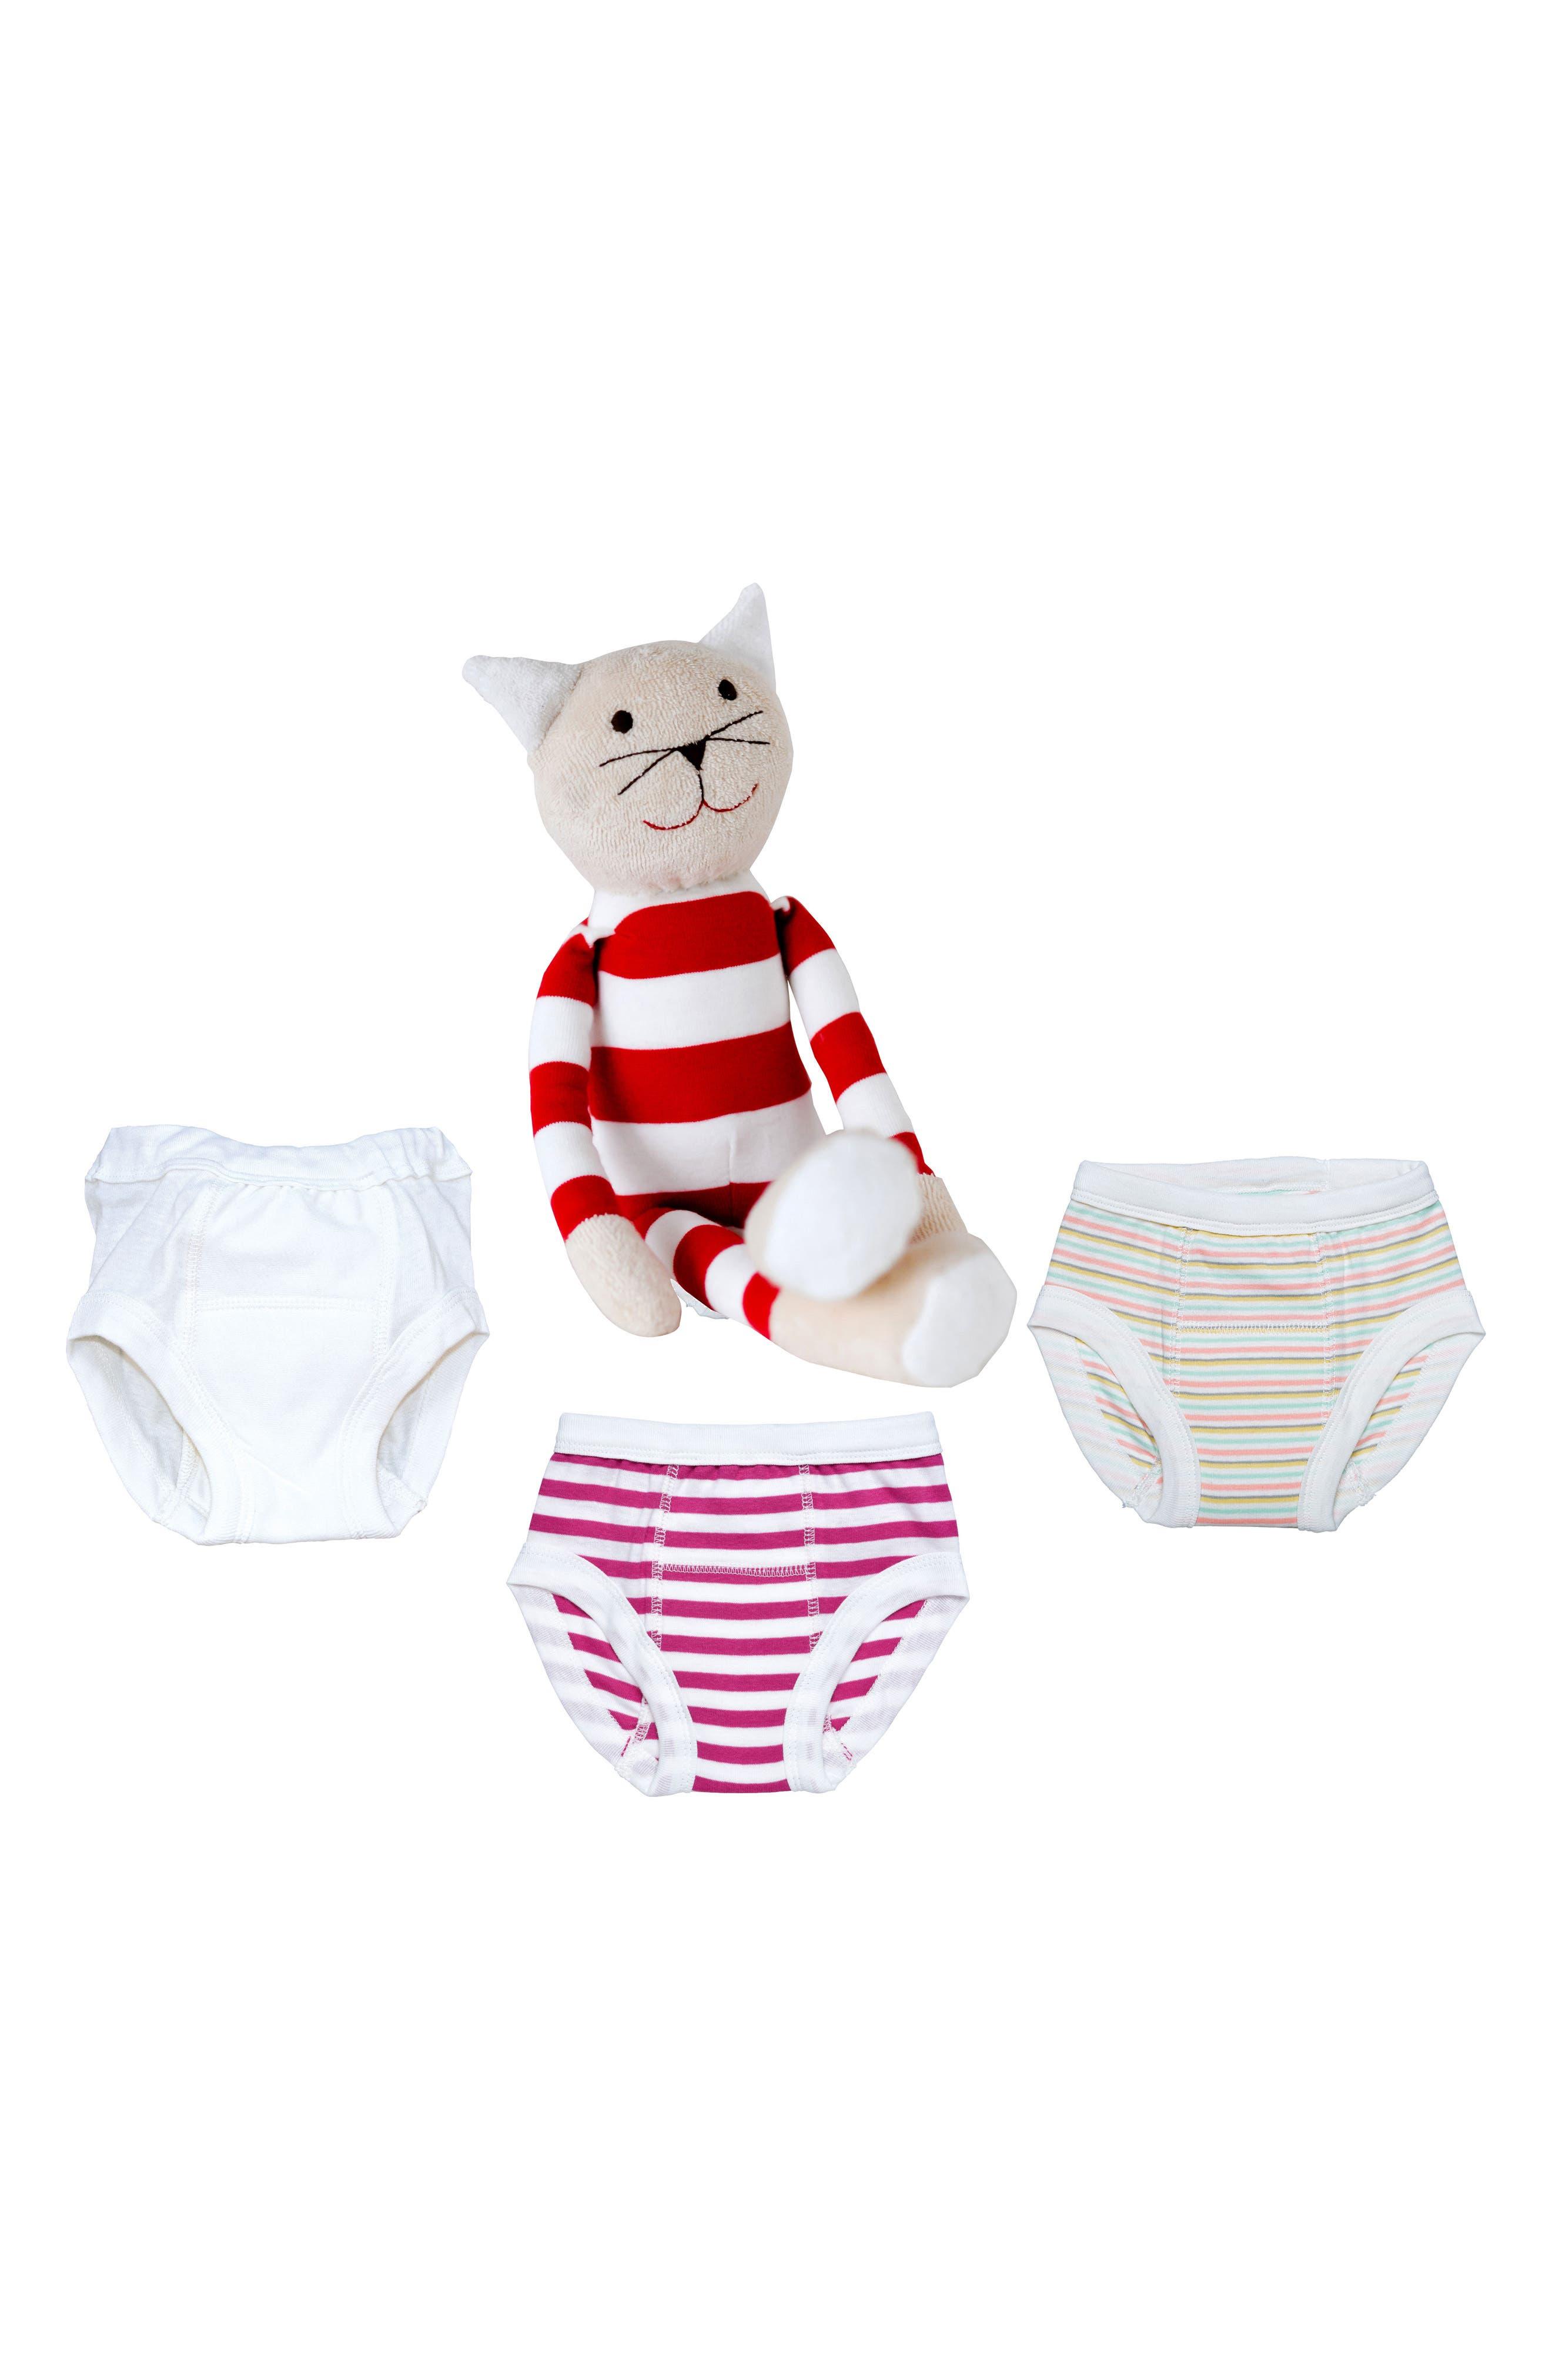 4-Piece Training Pants & Tilly Stuffed Animal Set,                             Alternate thumbnail 2, color,                             PINK